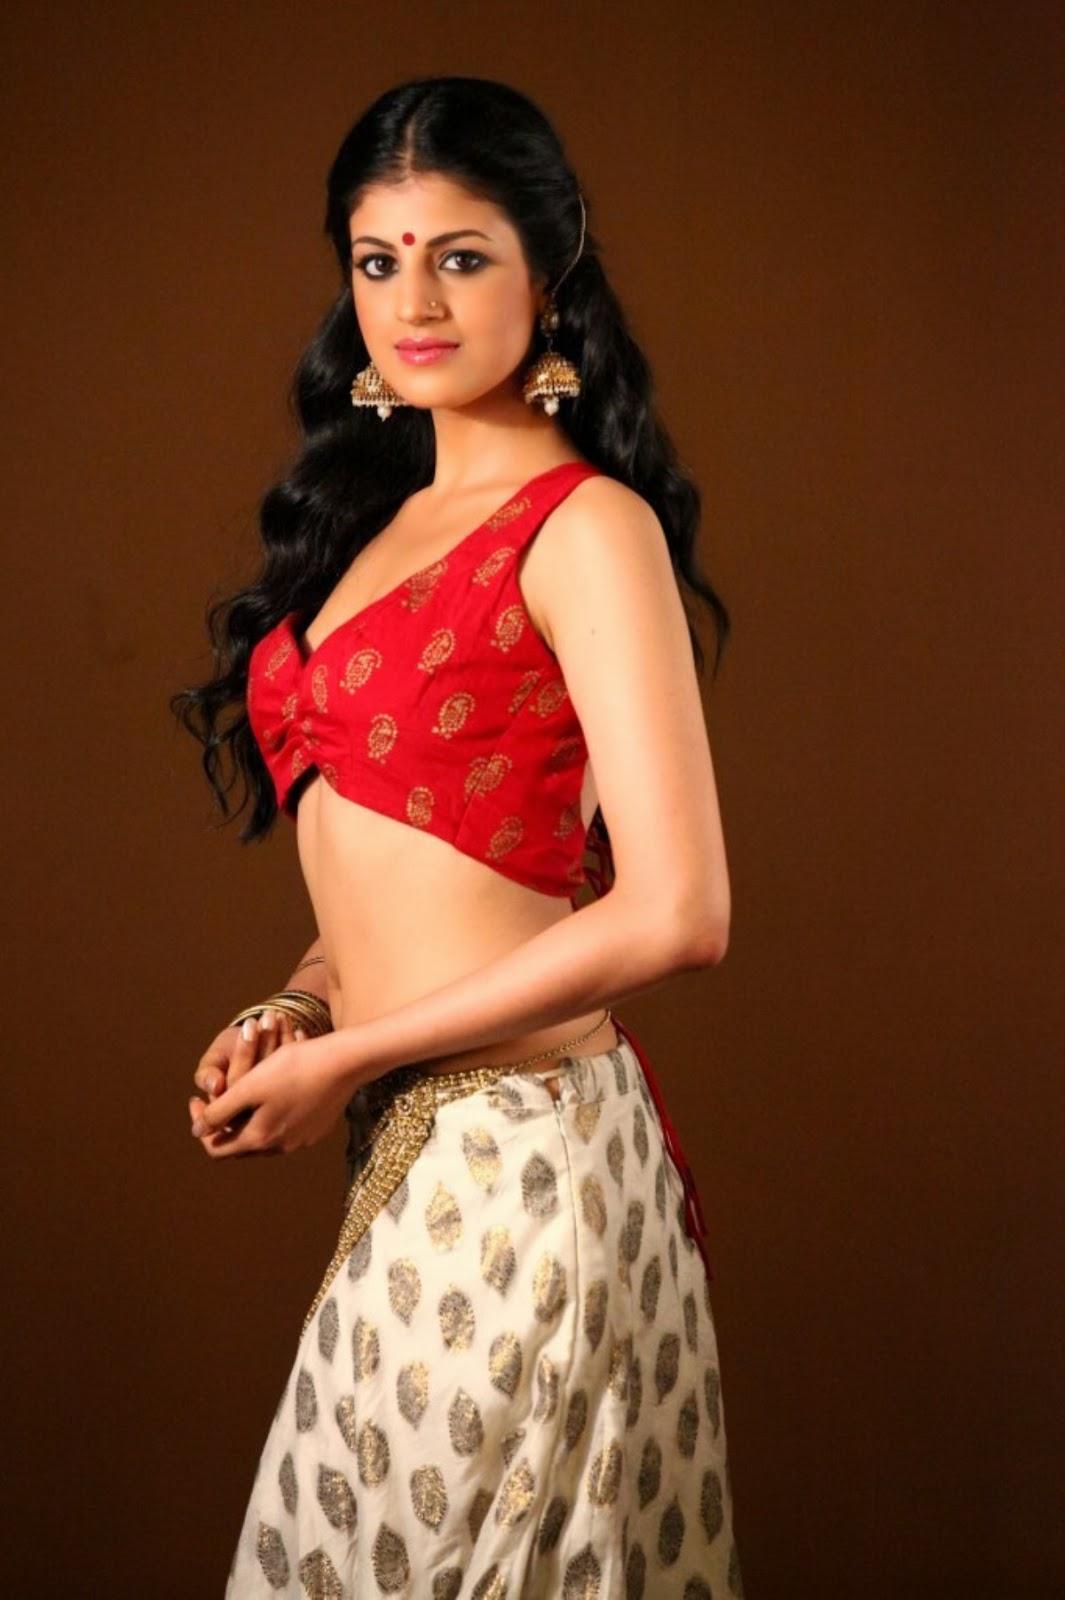 Sapna sehravat latest hot photoshoot stills hot blog photos for Latest hottest pics